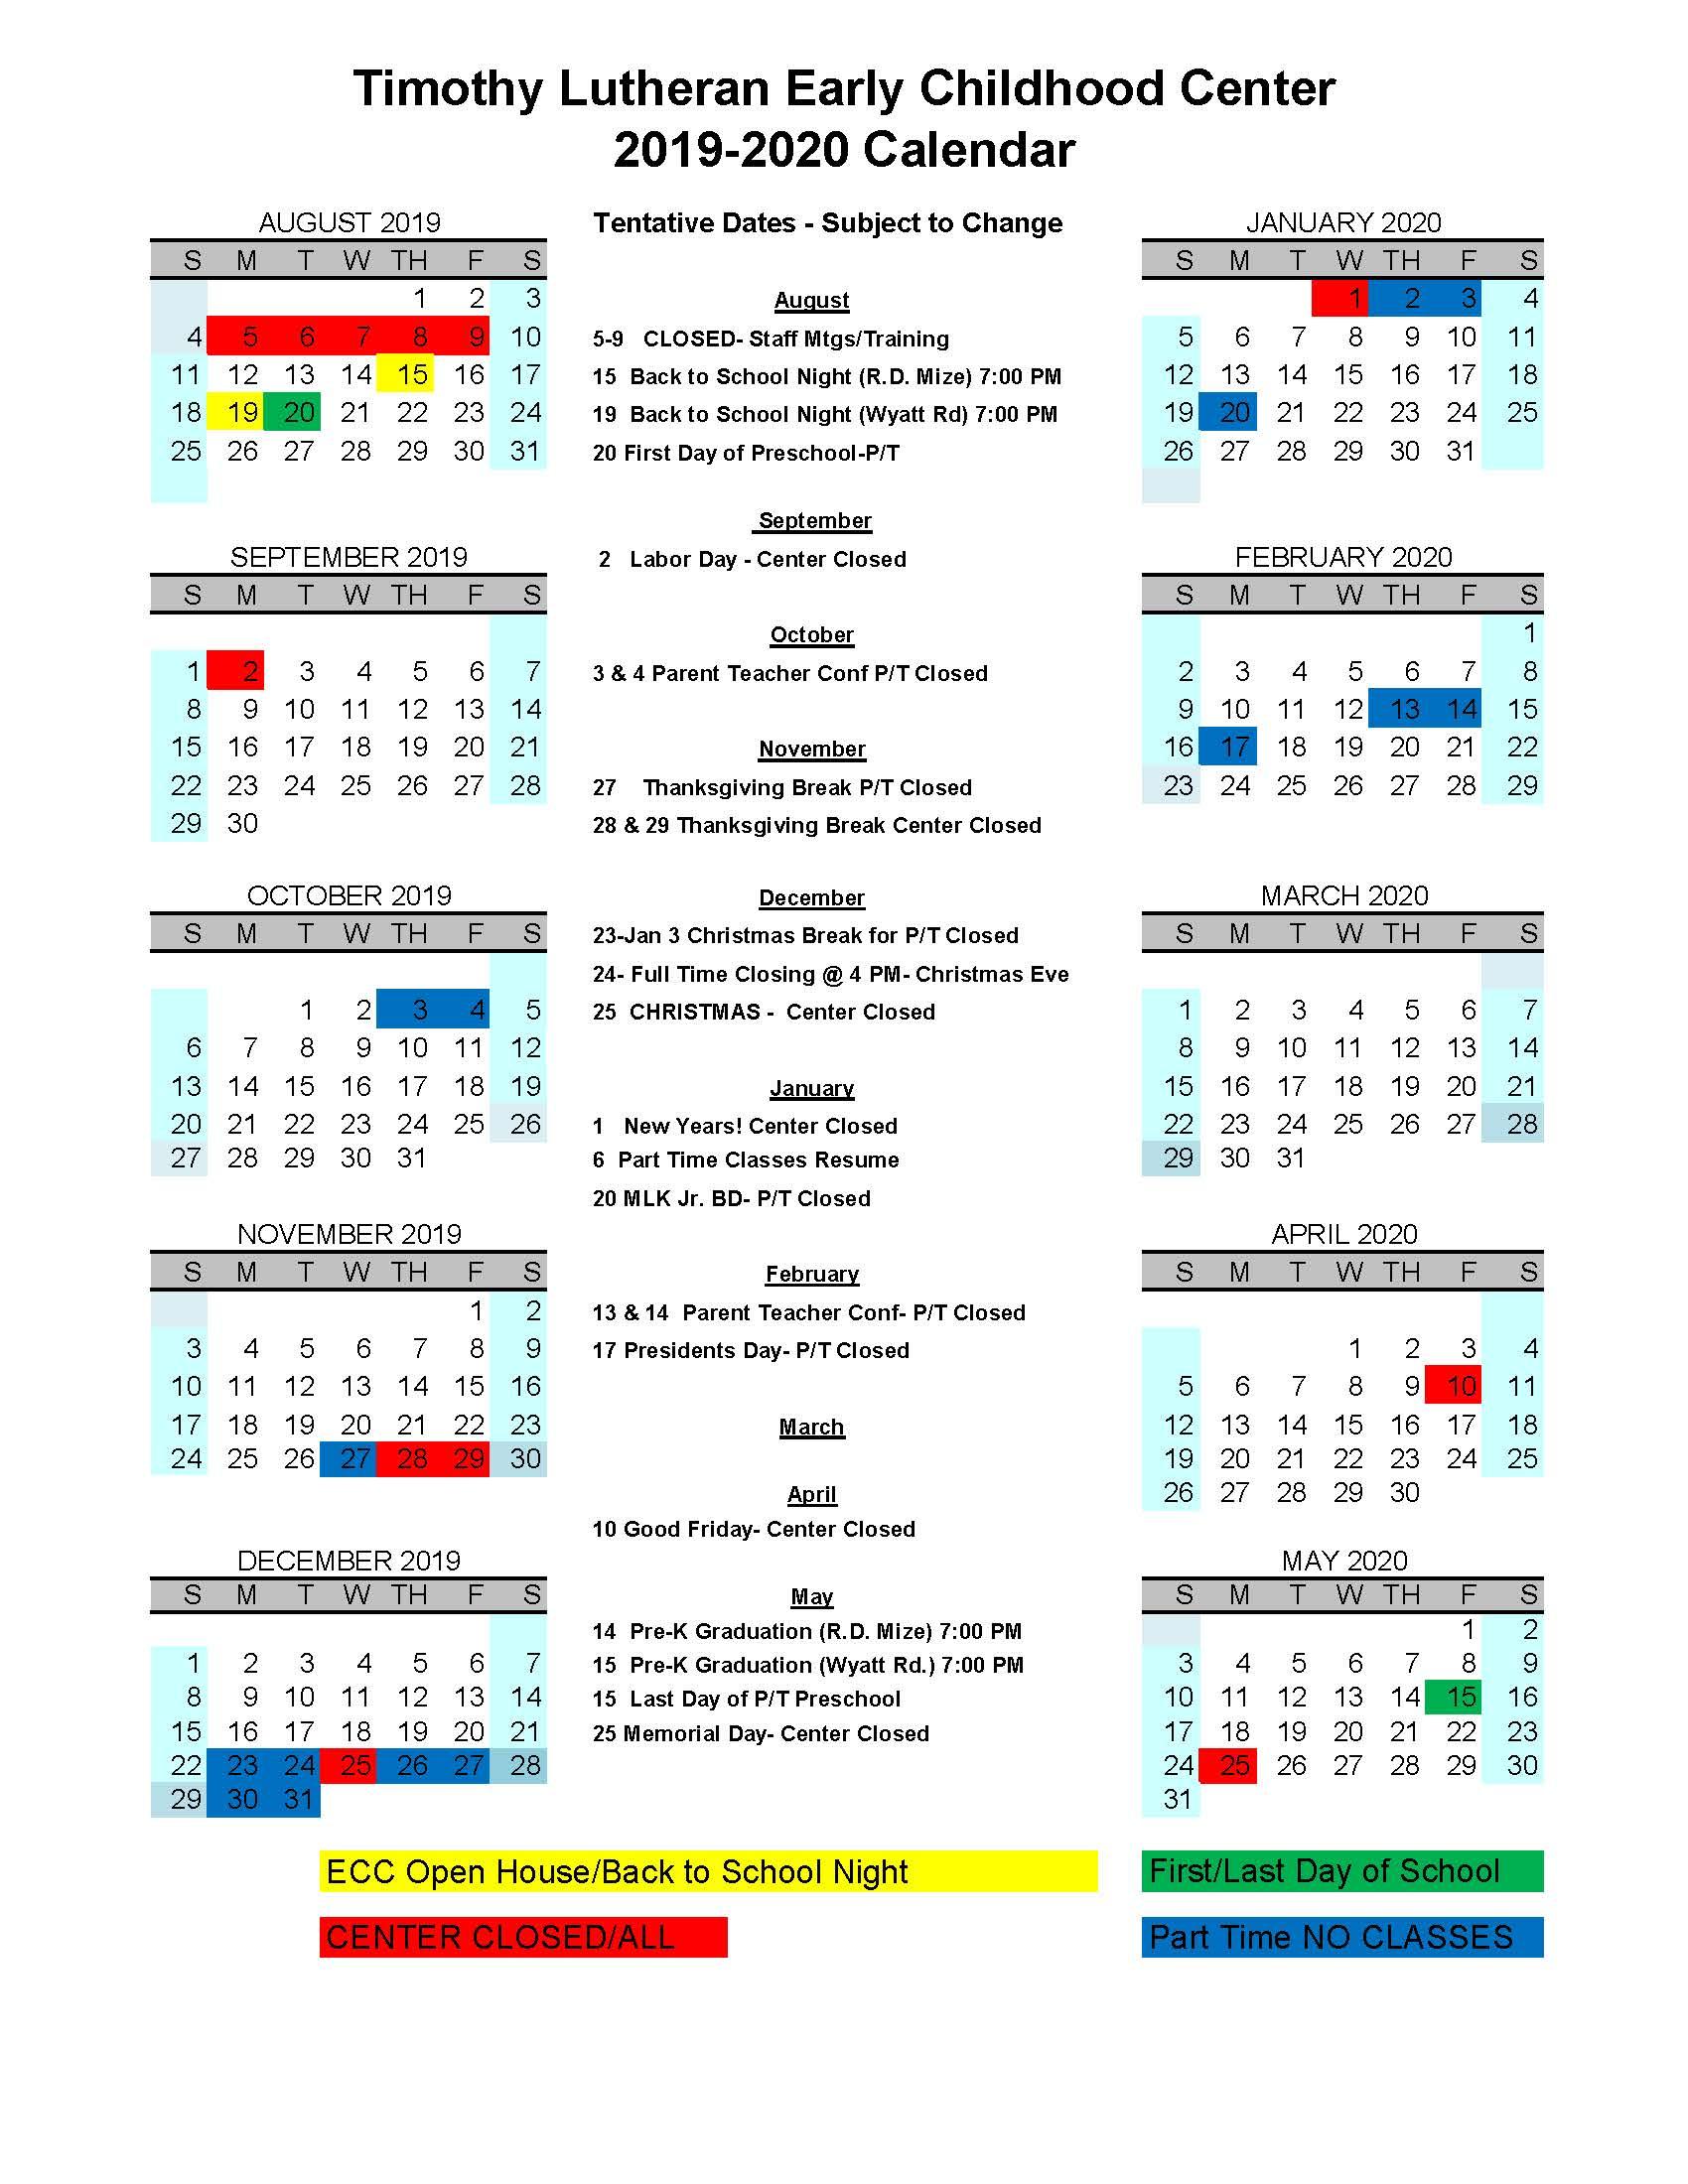 Ecc Calendar.Early Childhood Center Timothy Lutheran School